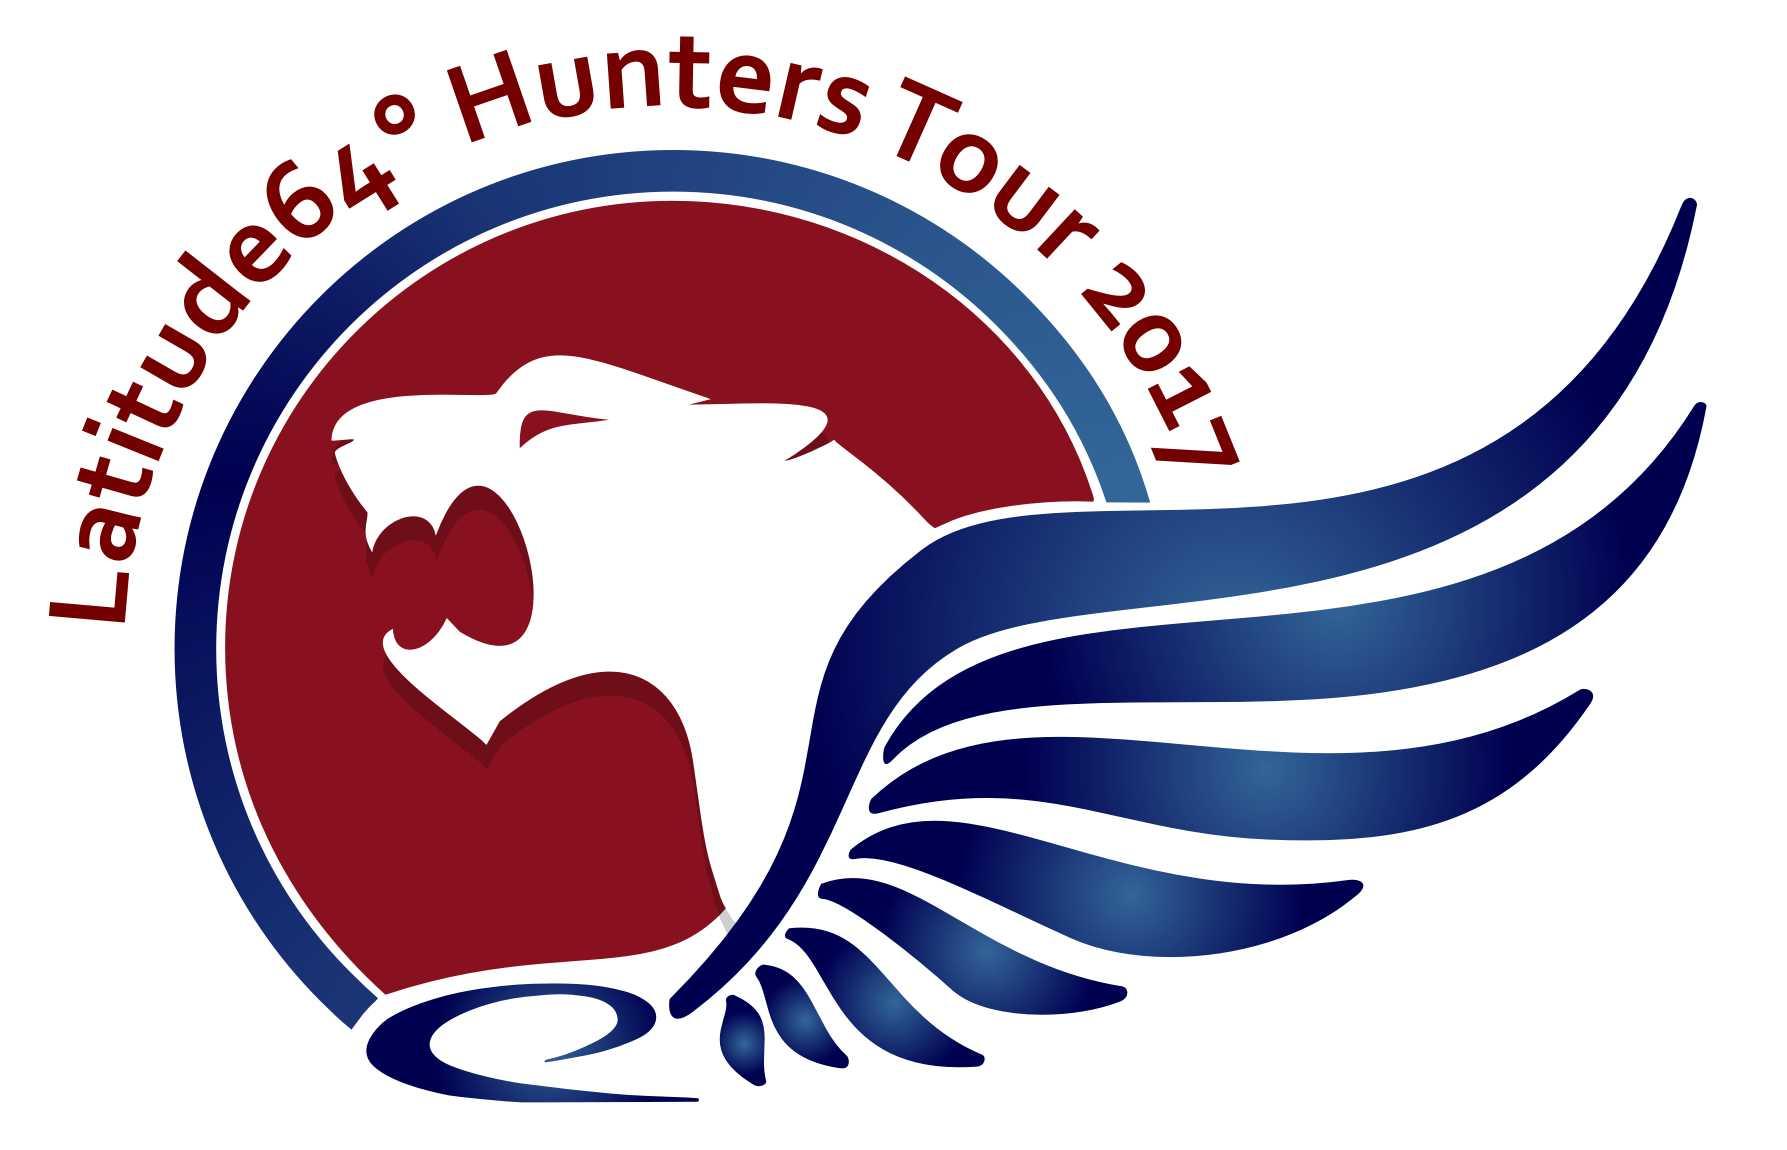 Akturalizované výsledky Tour